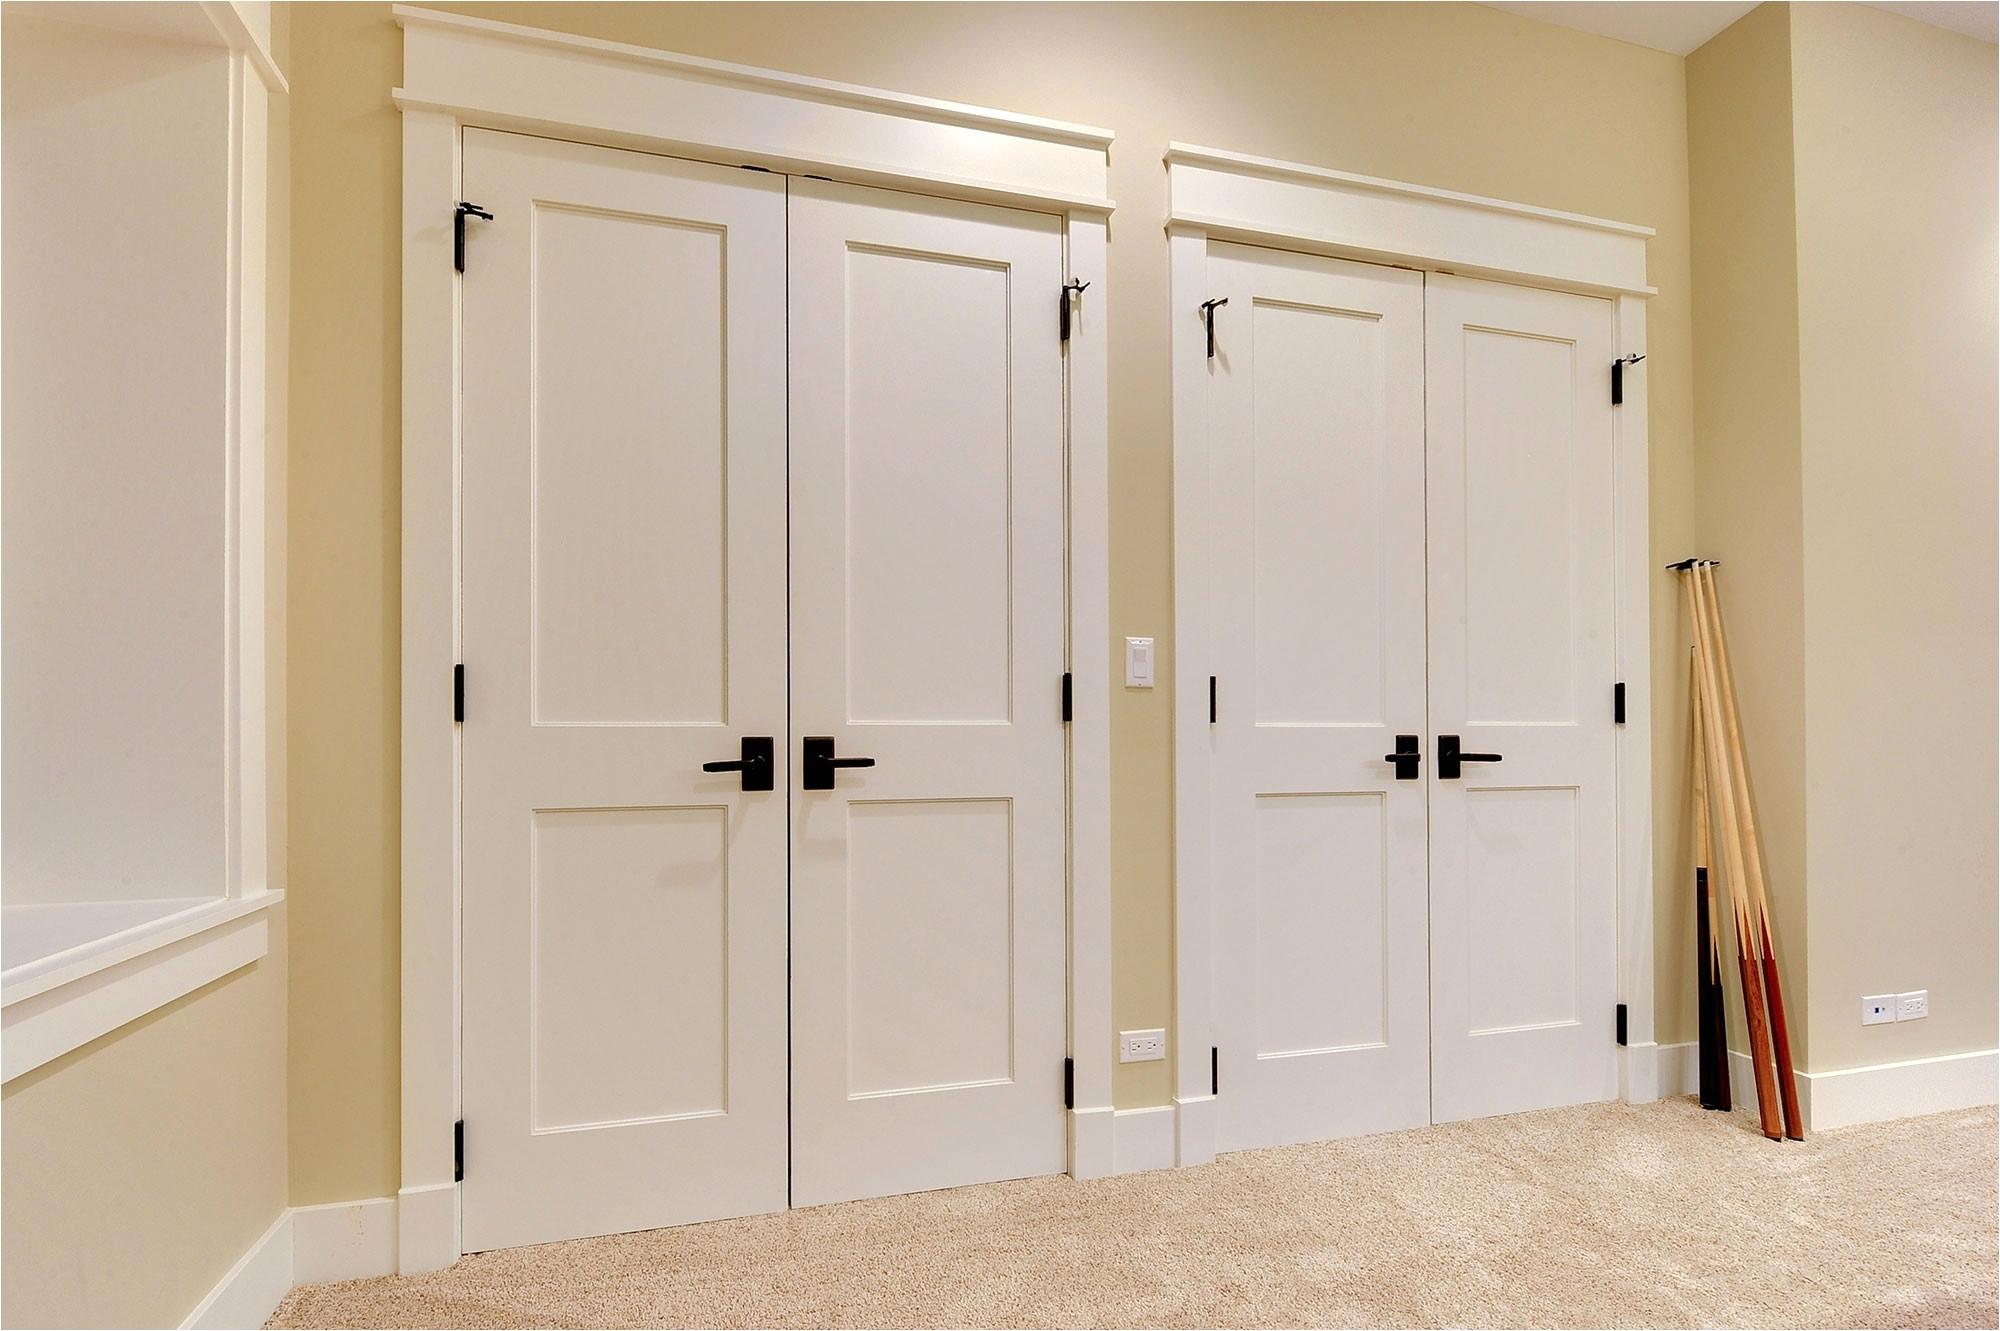 Bifold Interior Closet Doors 50 Luxury Louvered Interior Doors Images 50  Photos Home Improvement